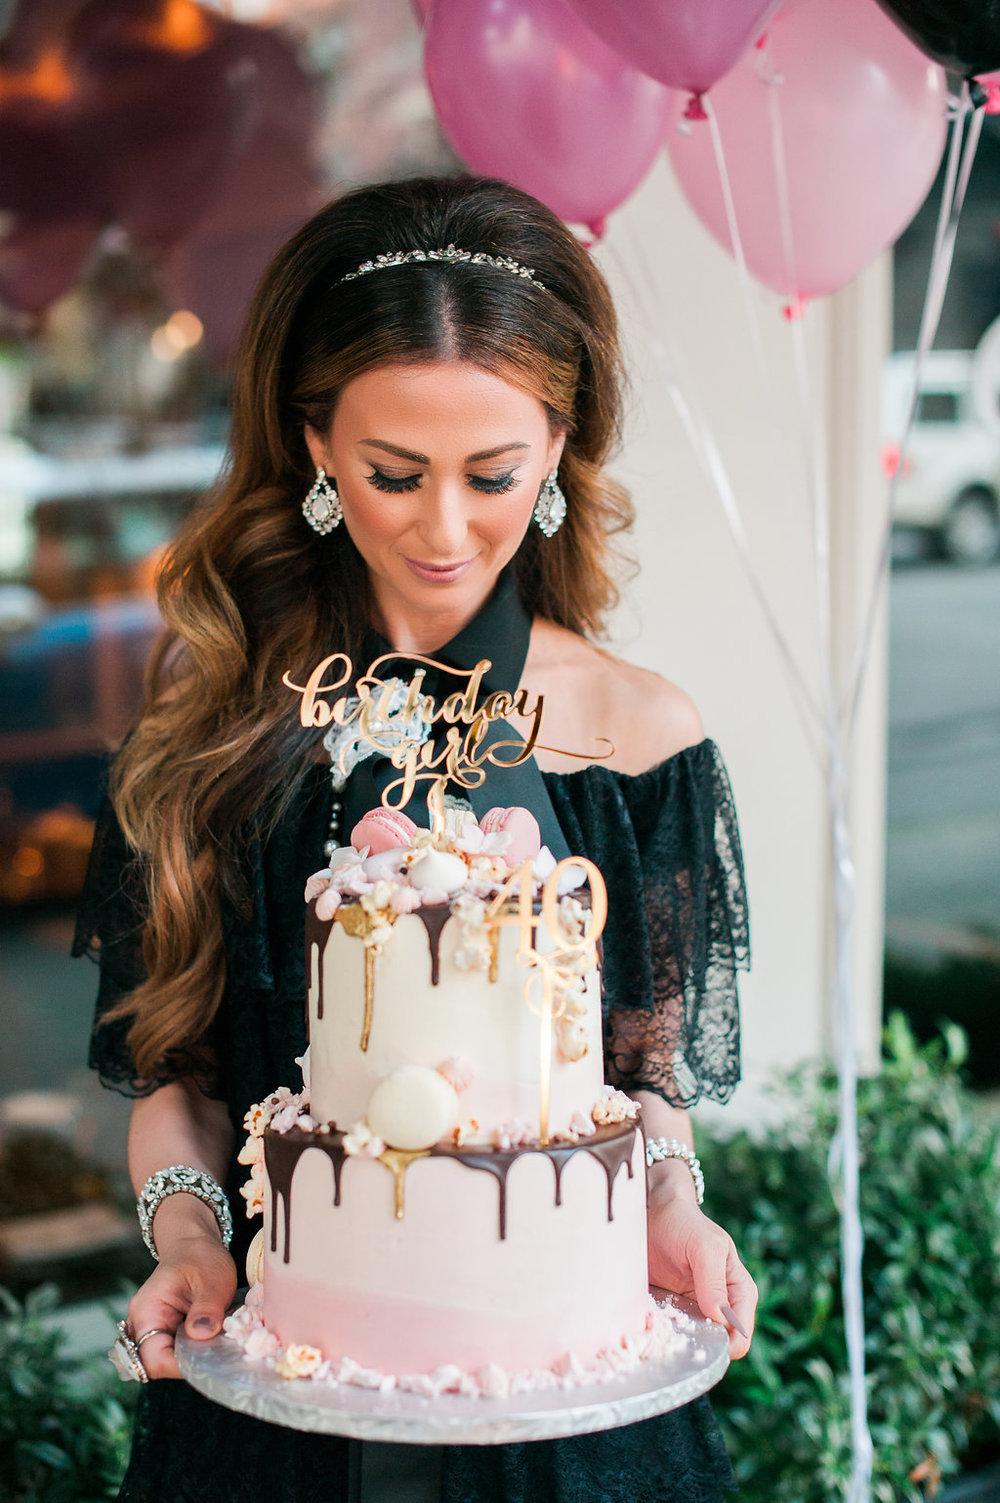 CAKE, LE GATEAU BAKESHOP